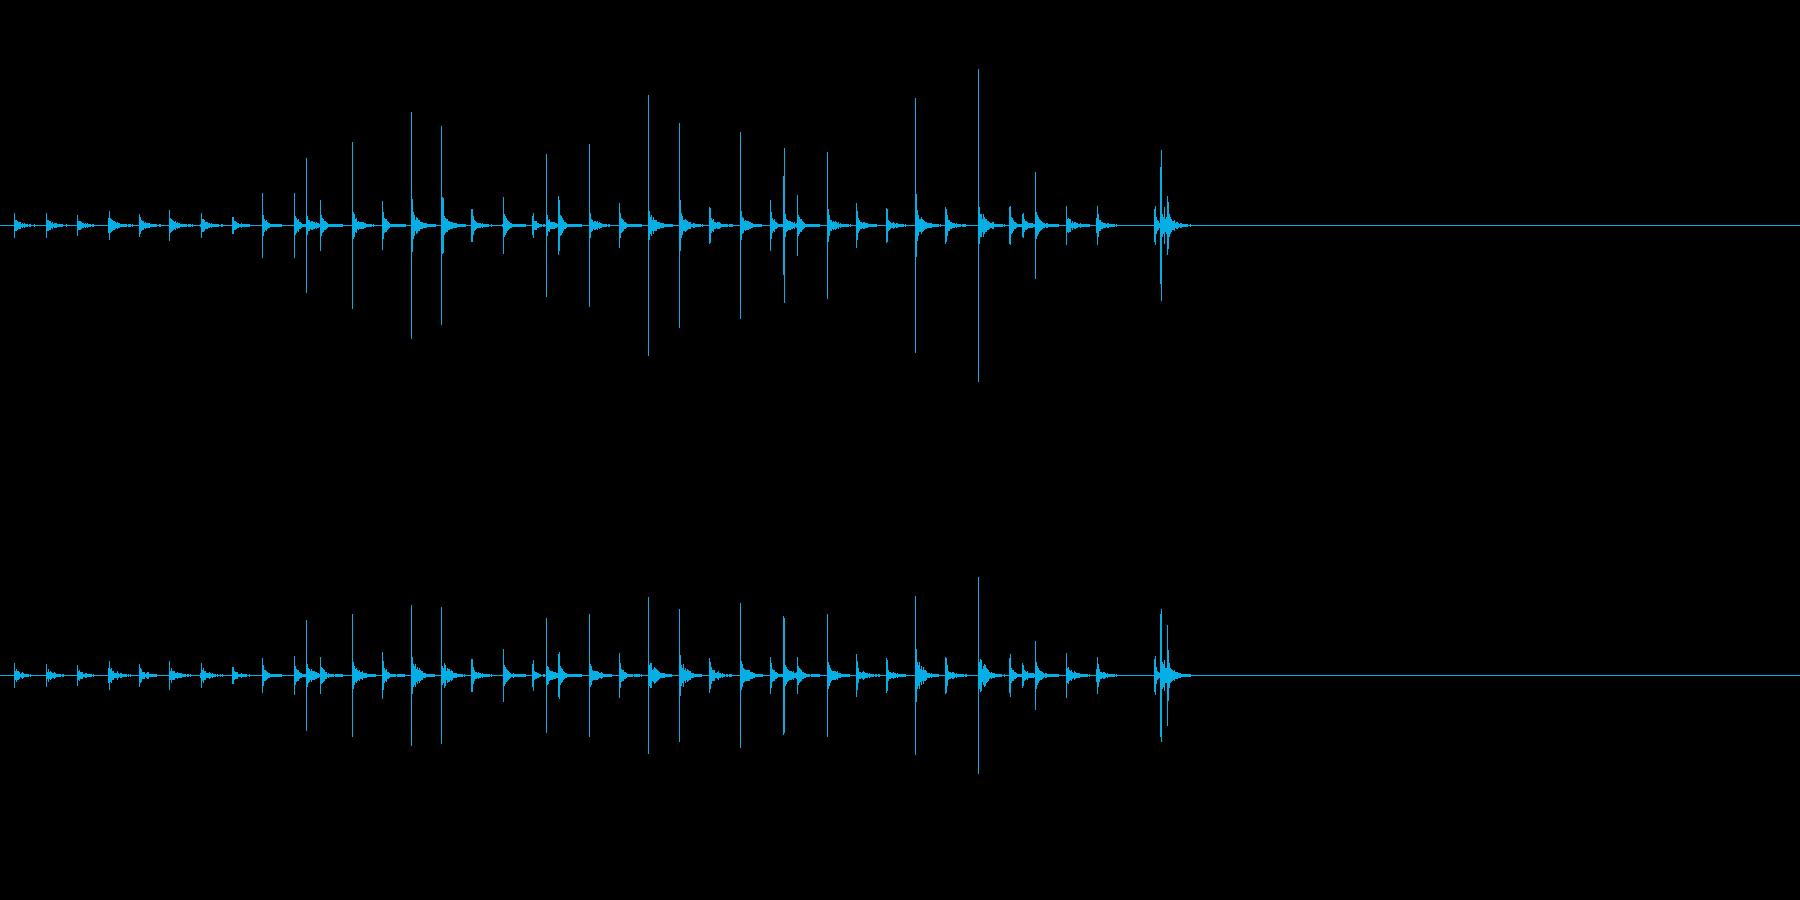 小木魚木章5歌舞伎黒御簾下座音楽和風日本の再生済みの波形